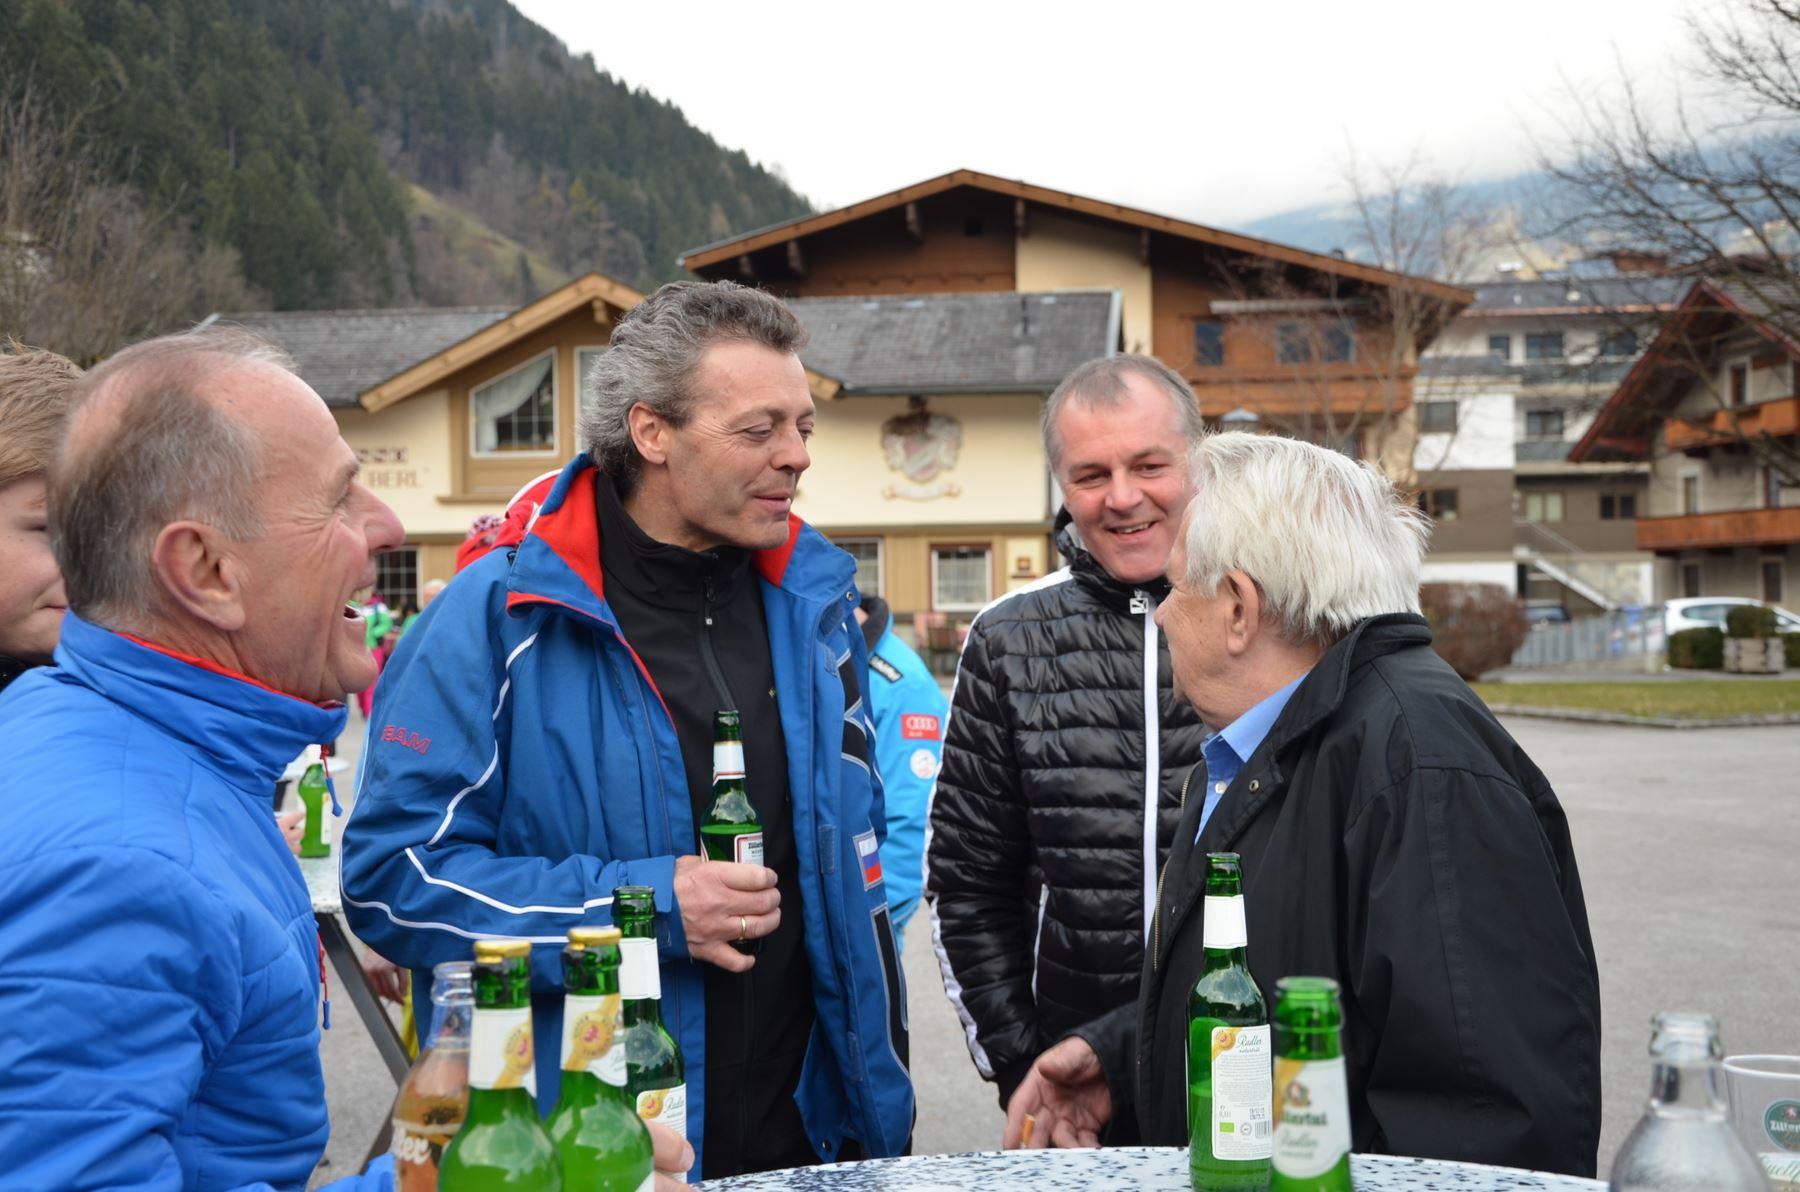 2015-03-22 BV Zillertal Skirennen 341.JPG